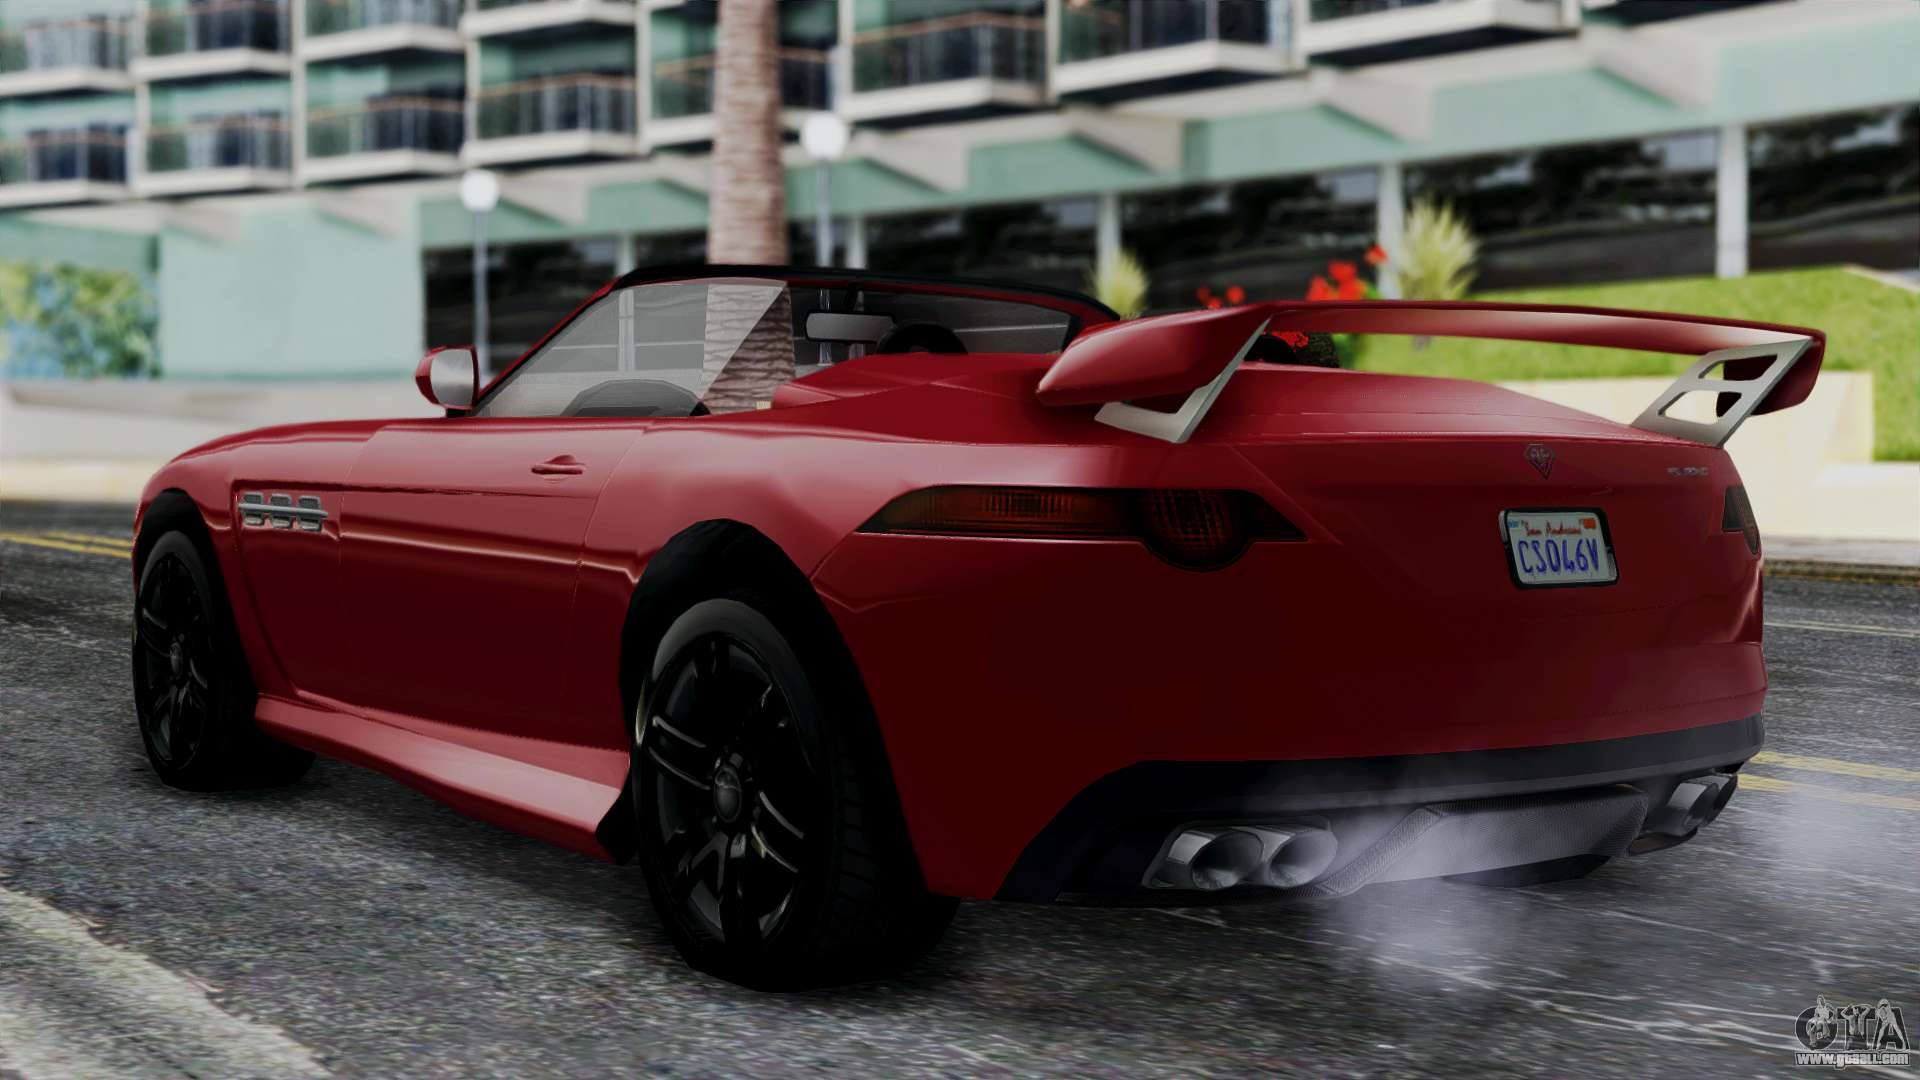 Gta San Andreas Game Modes Download